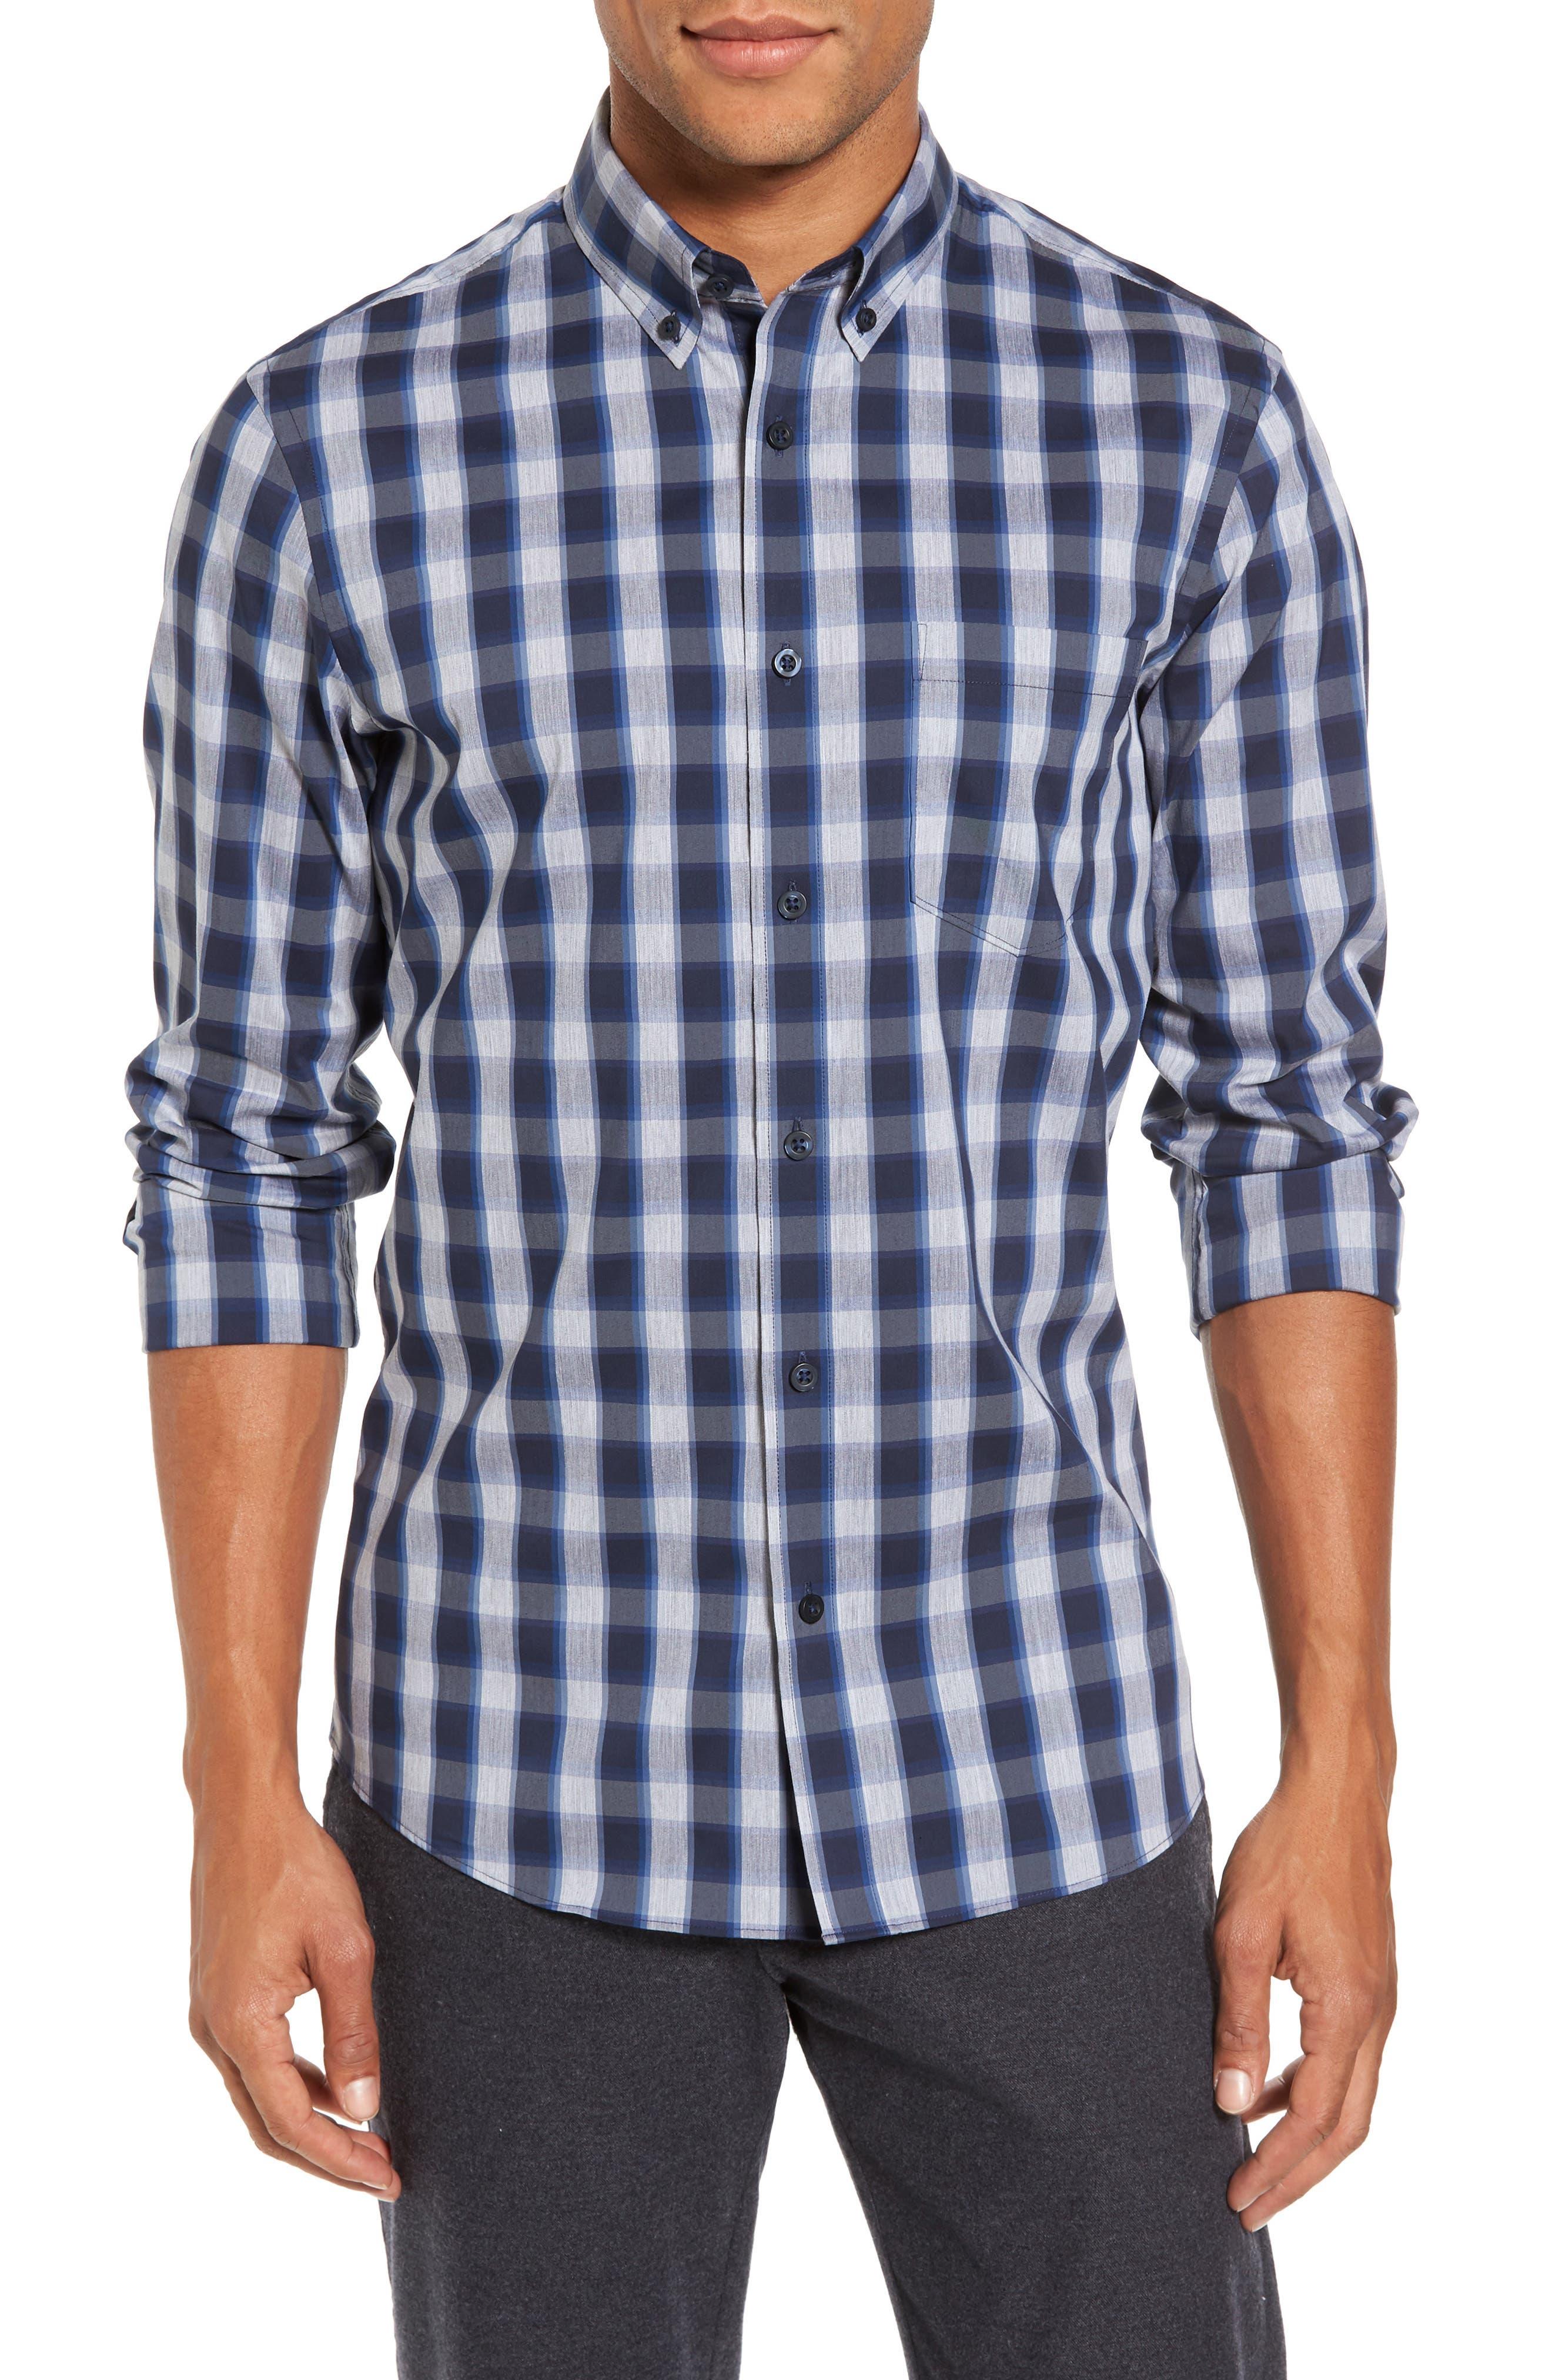 Alternate Image 1 Selected - Nordstrom Men's Shop Spade Tech-Smart Trim Fit Check Sport Shirt